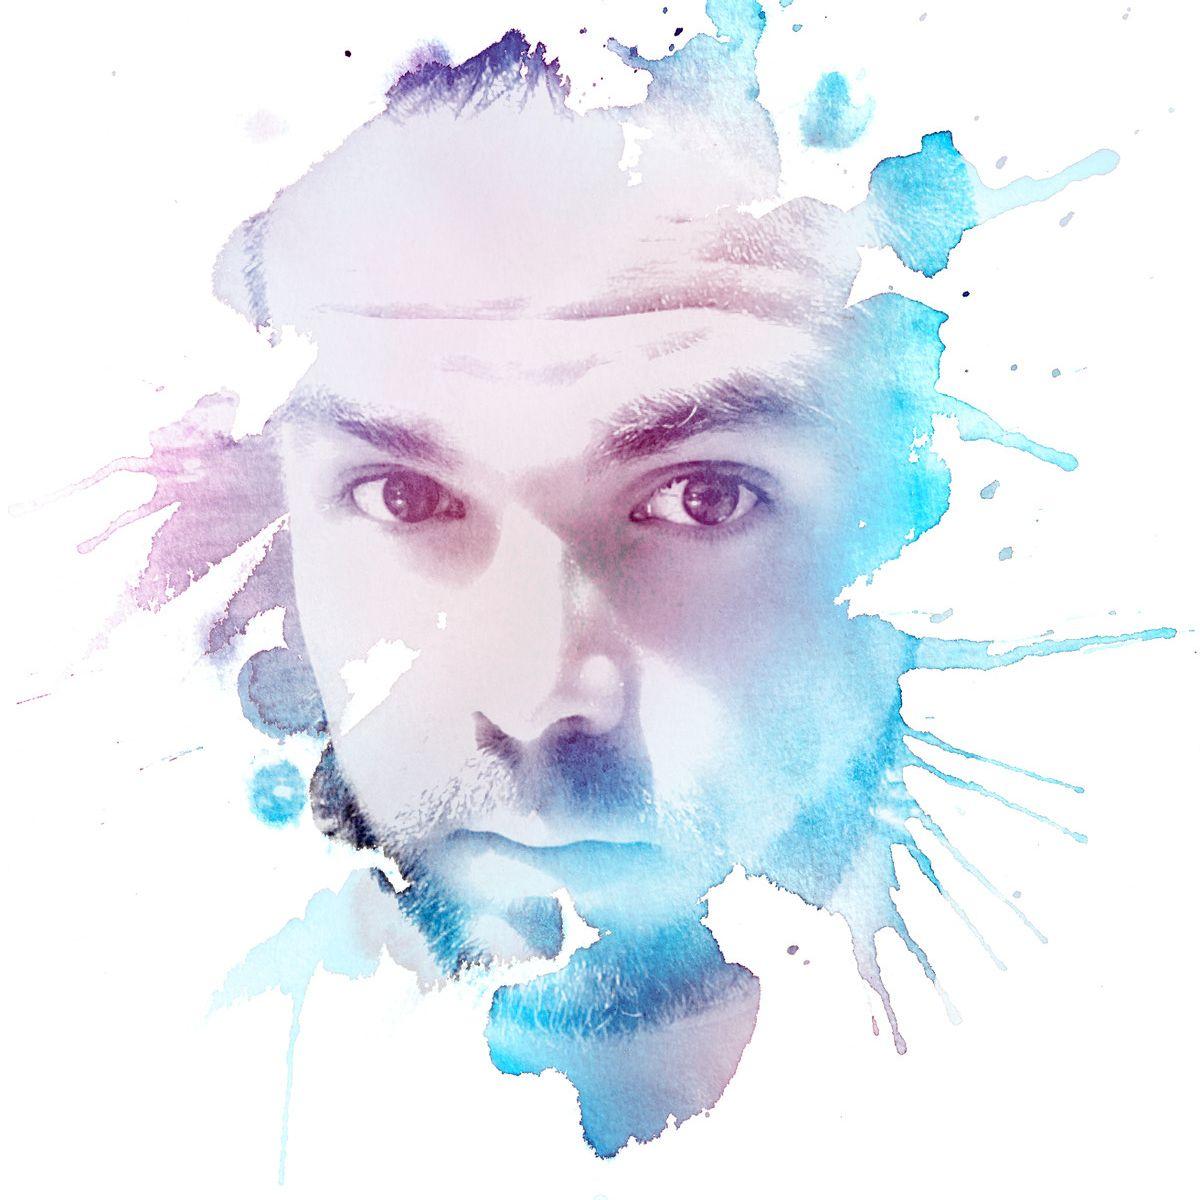 EDM Dance Electro House DJ Mix   Listen via Stitcher for